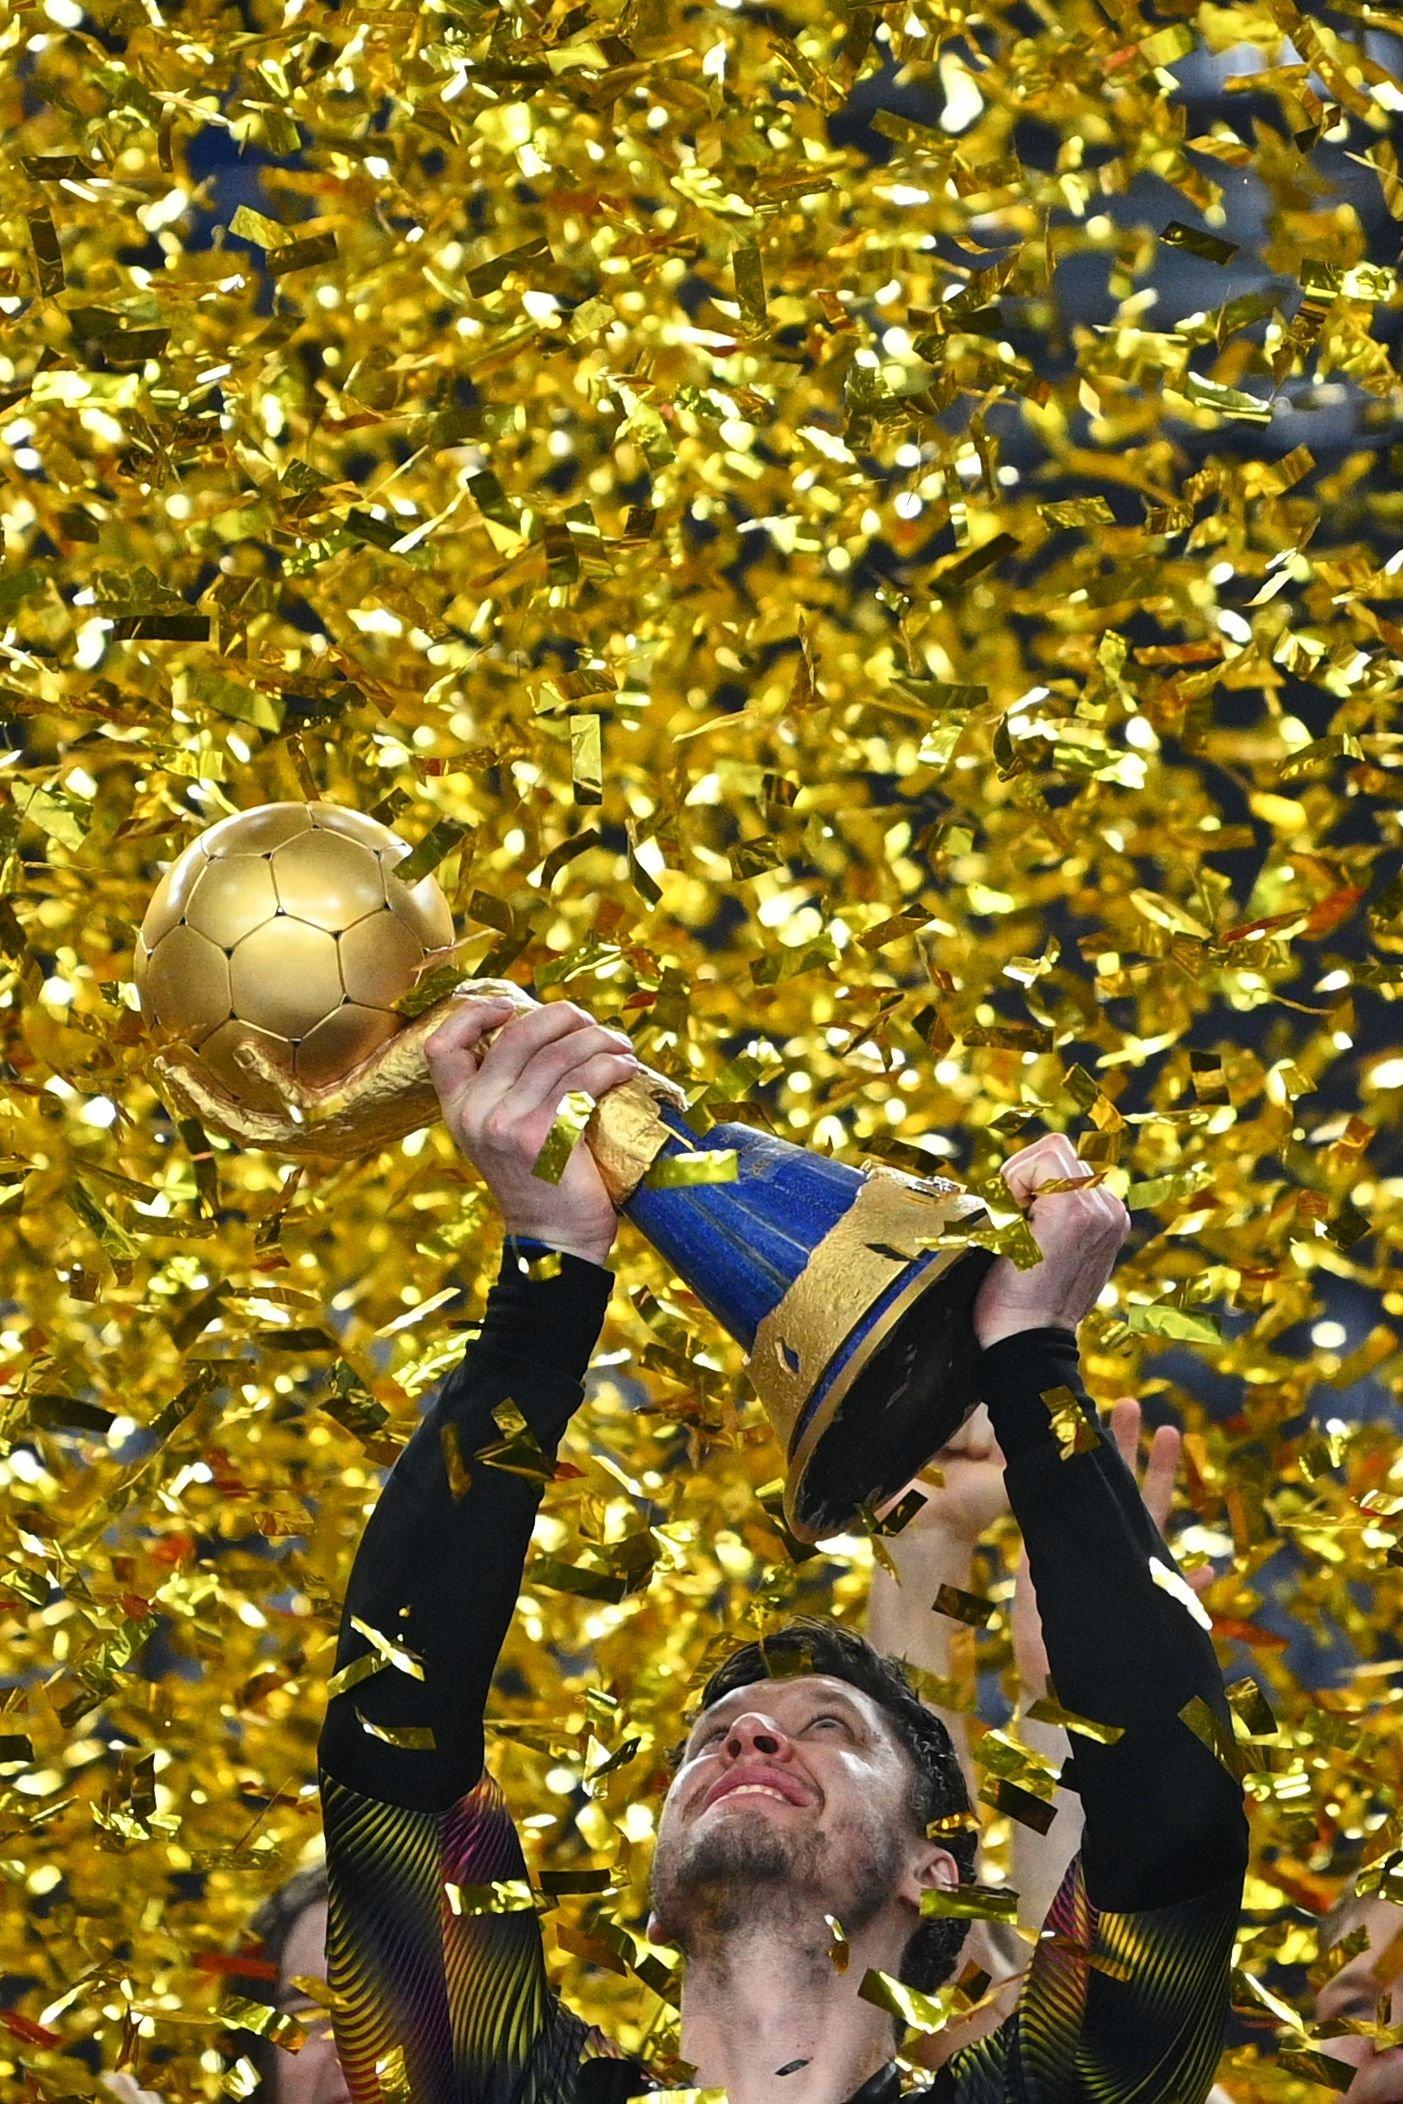 Denmark's goalkeeper Niklas Landin Jacobsen lifts the trophy after the 2021 World Men's Handball Championship final against Sweden at the Cairo Stadium Sports Hall, Cairo, Egypt, Jan. 31, 2021. (AFP Photo)